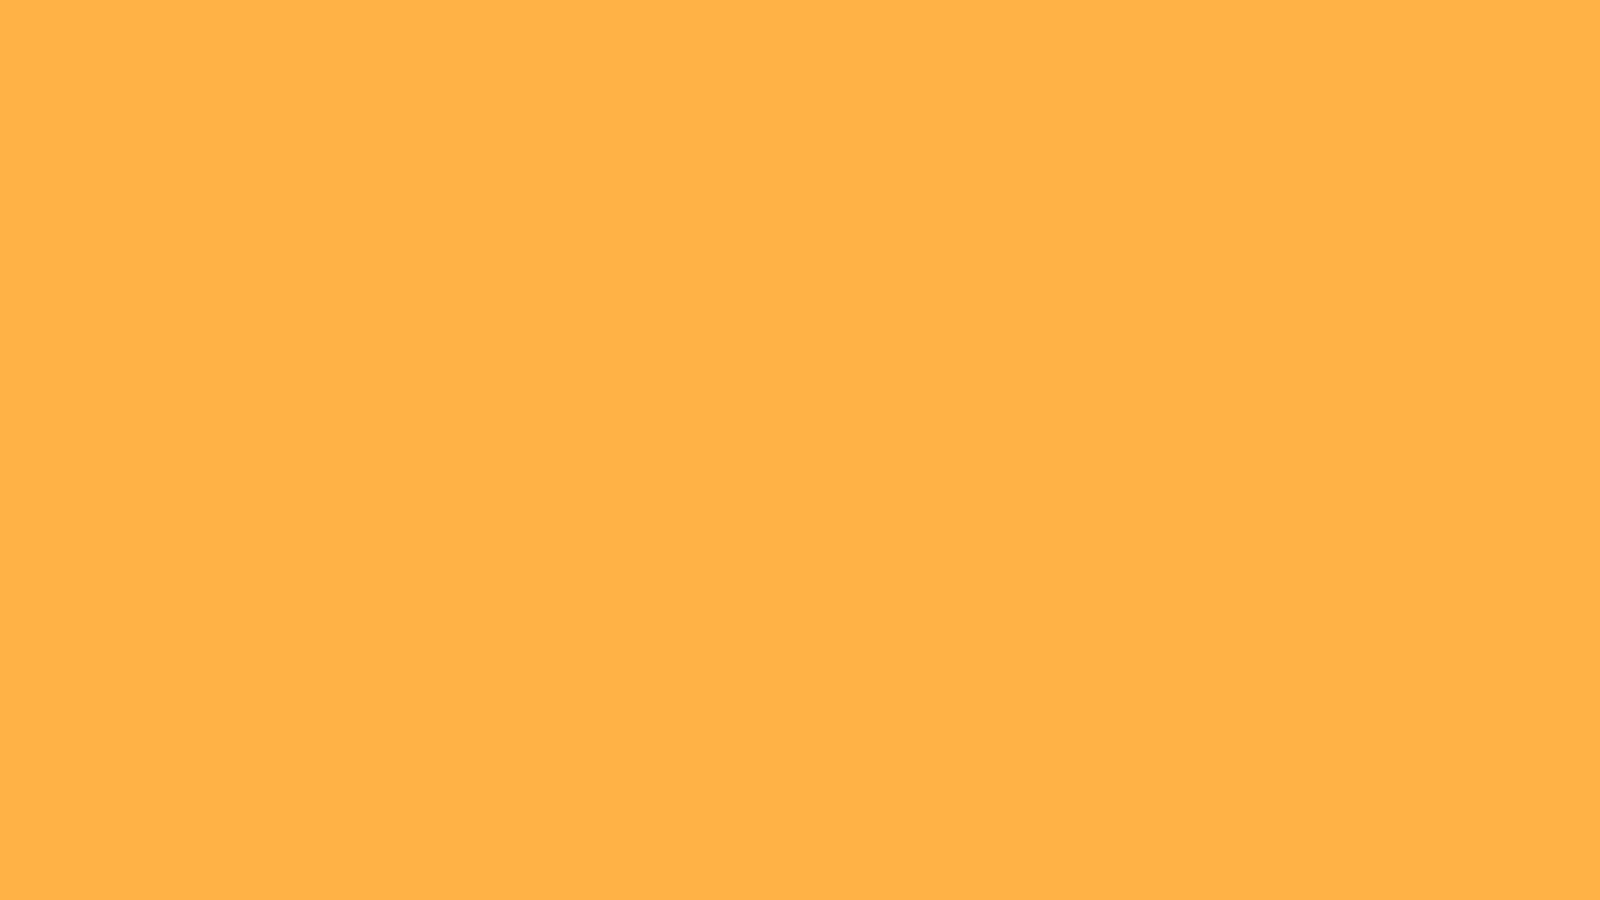 1600x900 Pastel Orange Solid Color Background